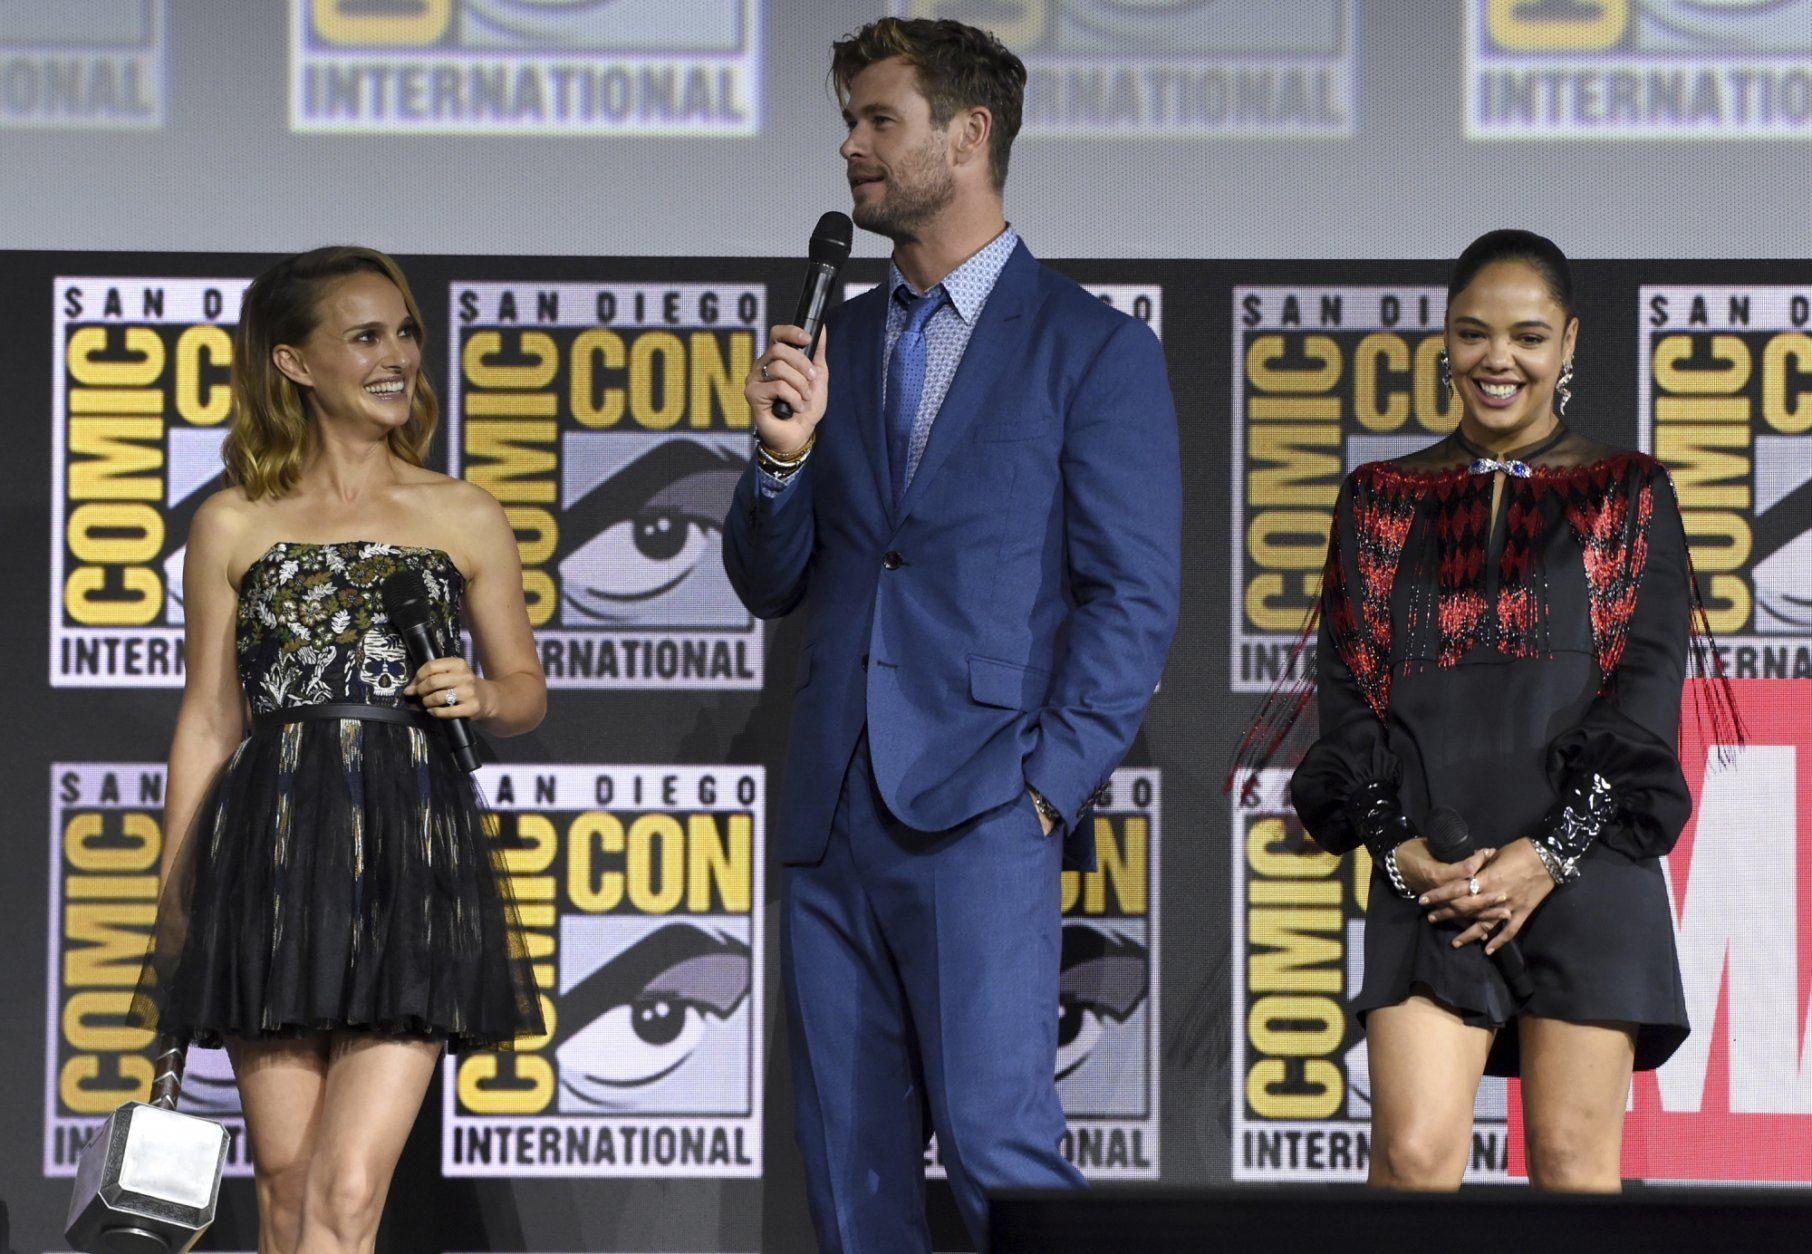 Natalie Portman, Chris Hemsworth, Tessa Thompson